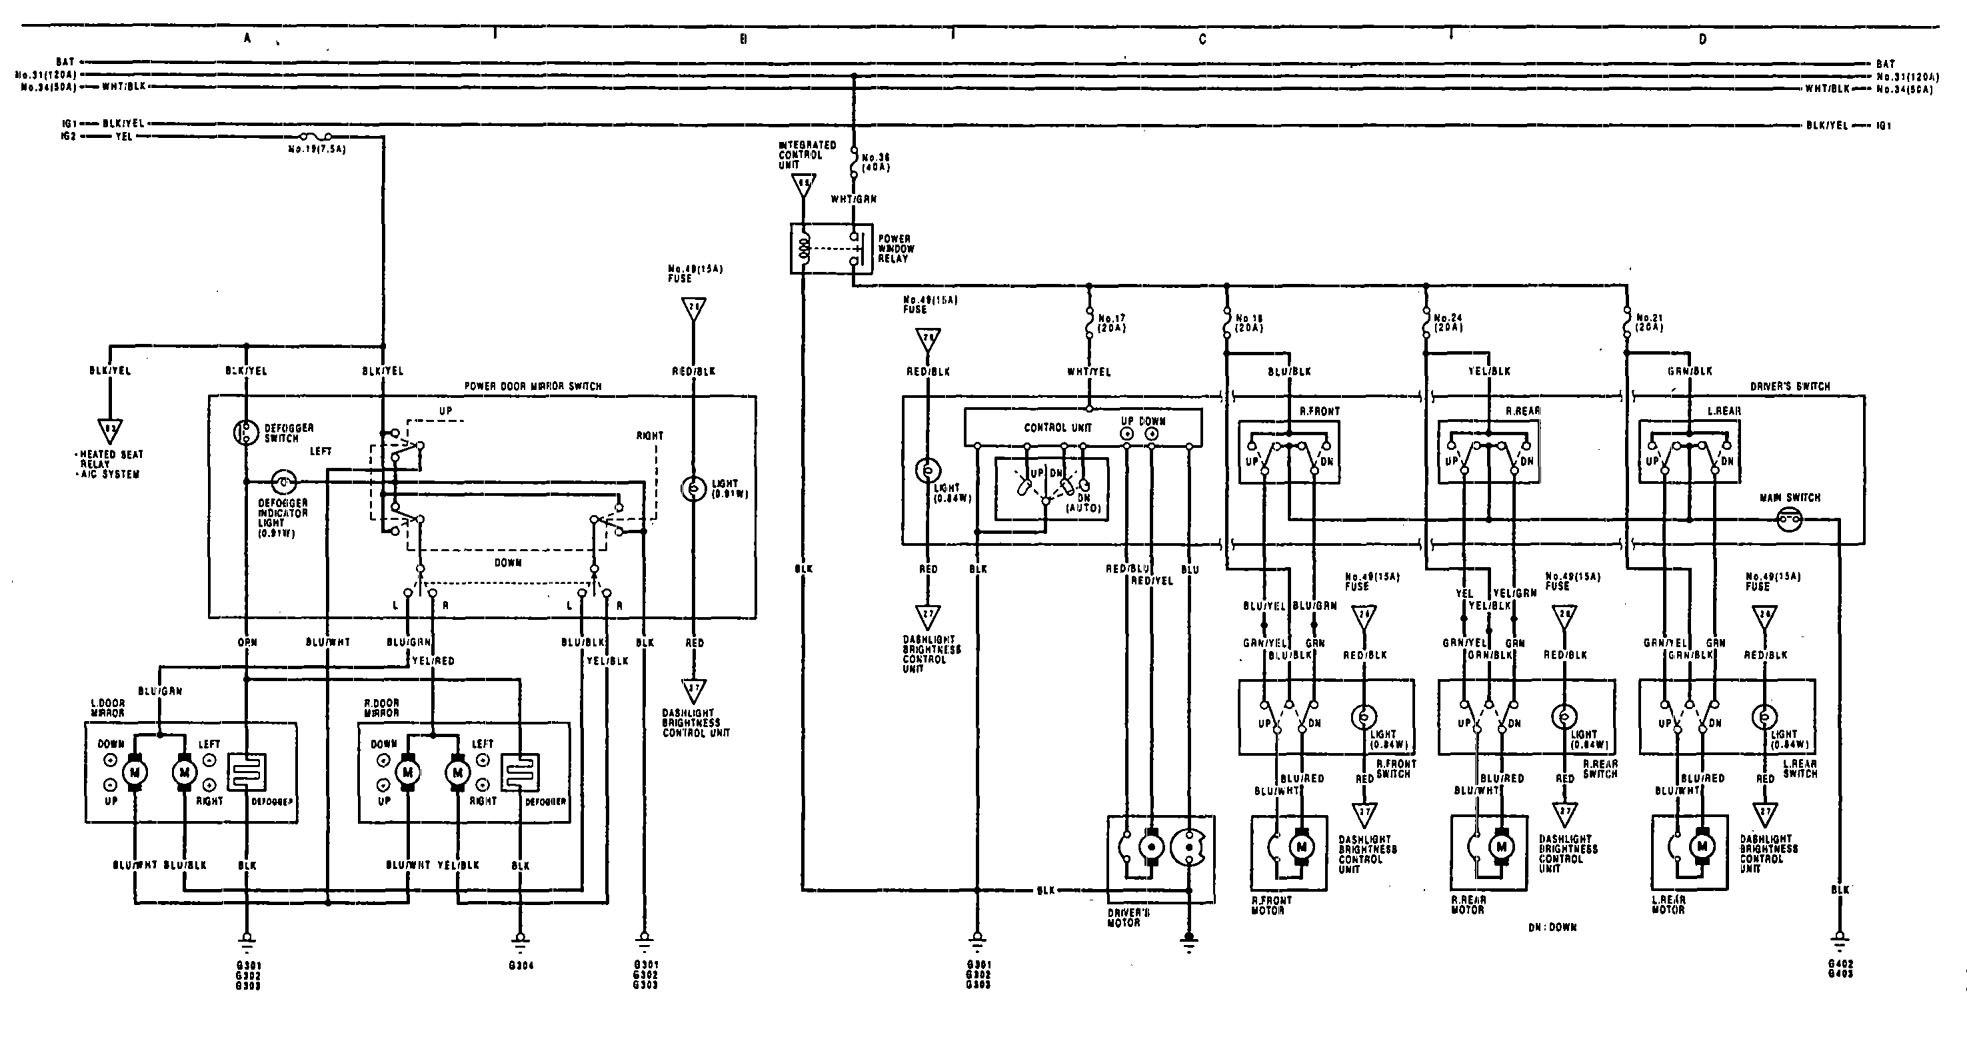 Wiring Diagram 92 Acura Vigor Library Remote Entry Keyless 2001 Xj 1991 Legend Diagramrhkomagoma